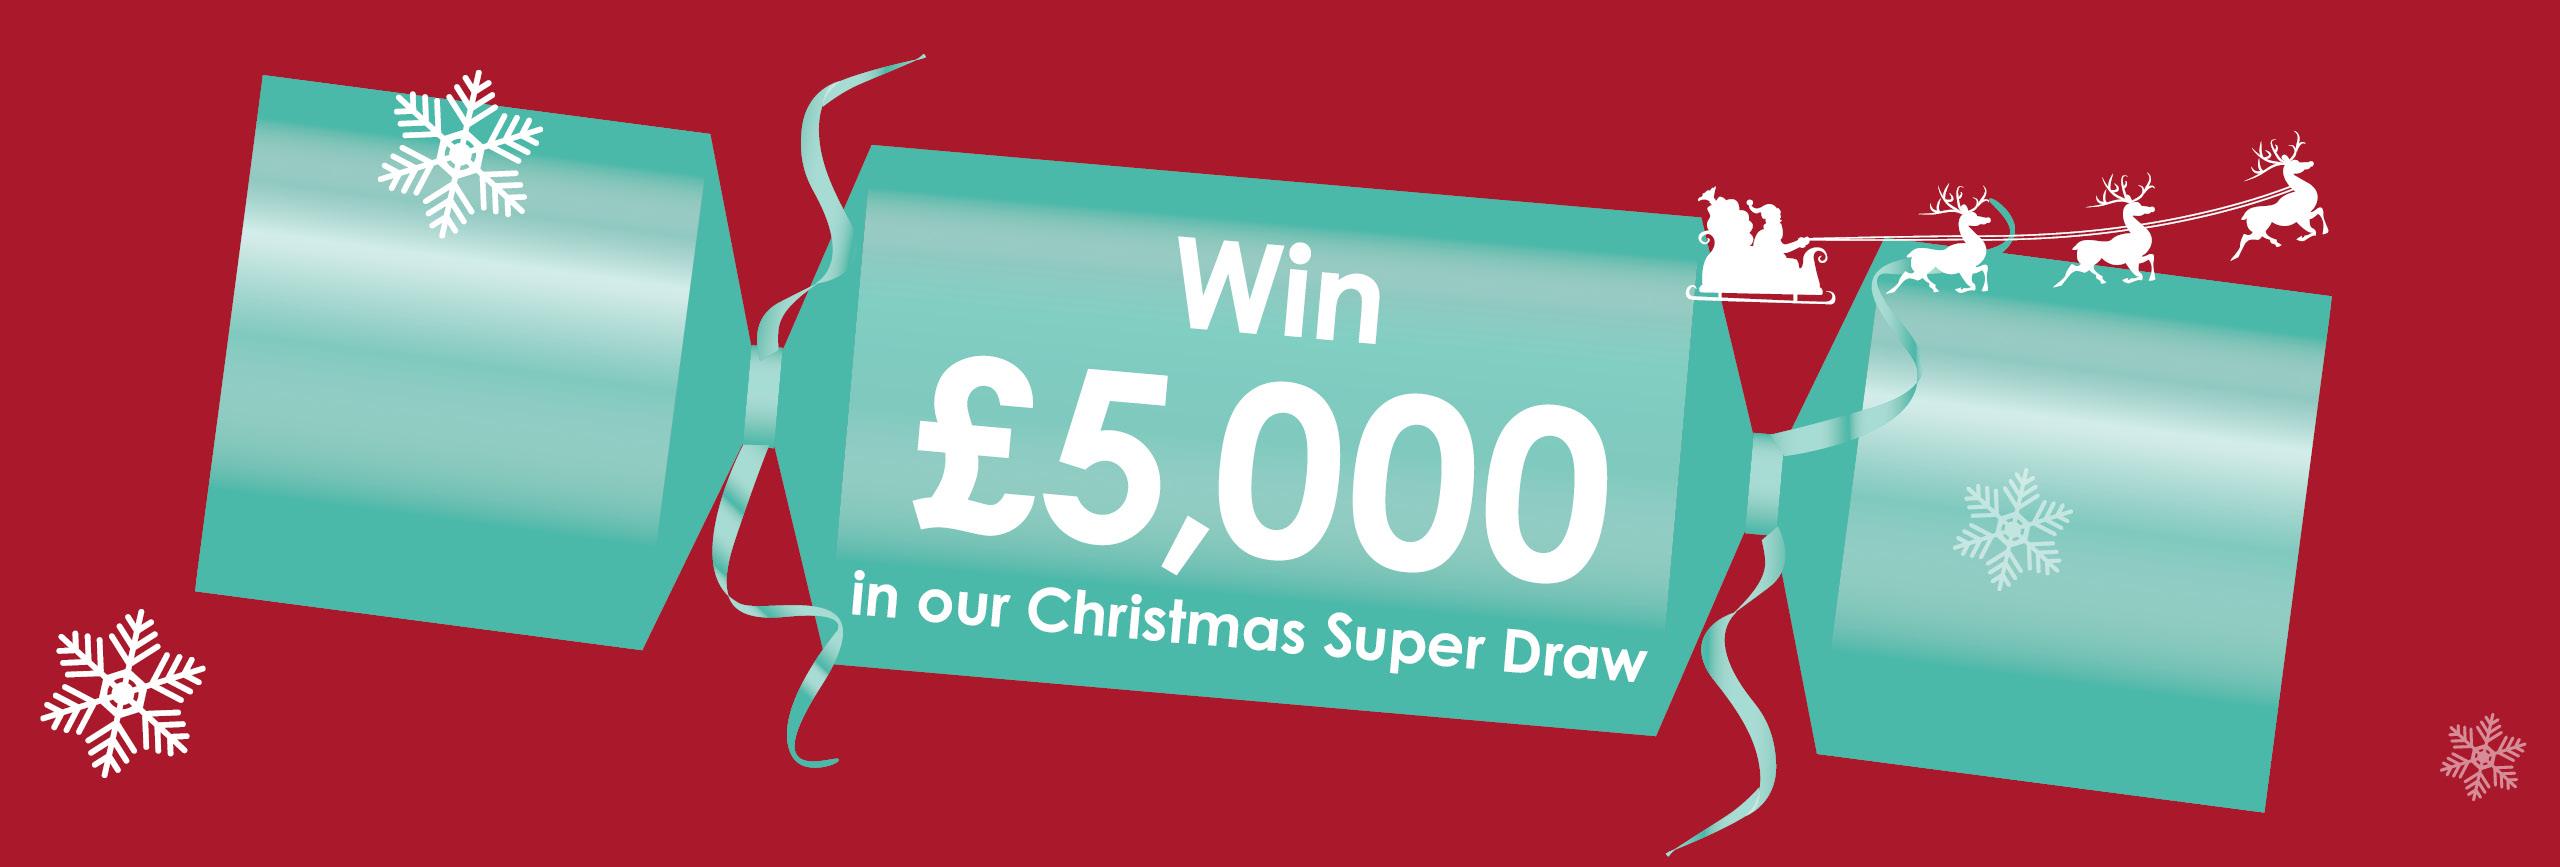 The Myton Hospices - ChristmasSuper Draw 2019 Flex Slider Lottery Raffle Win